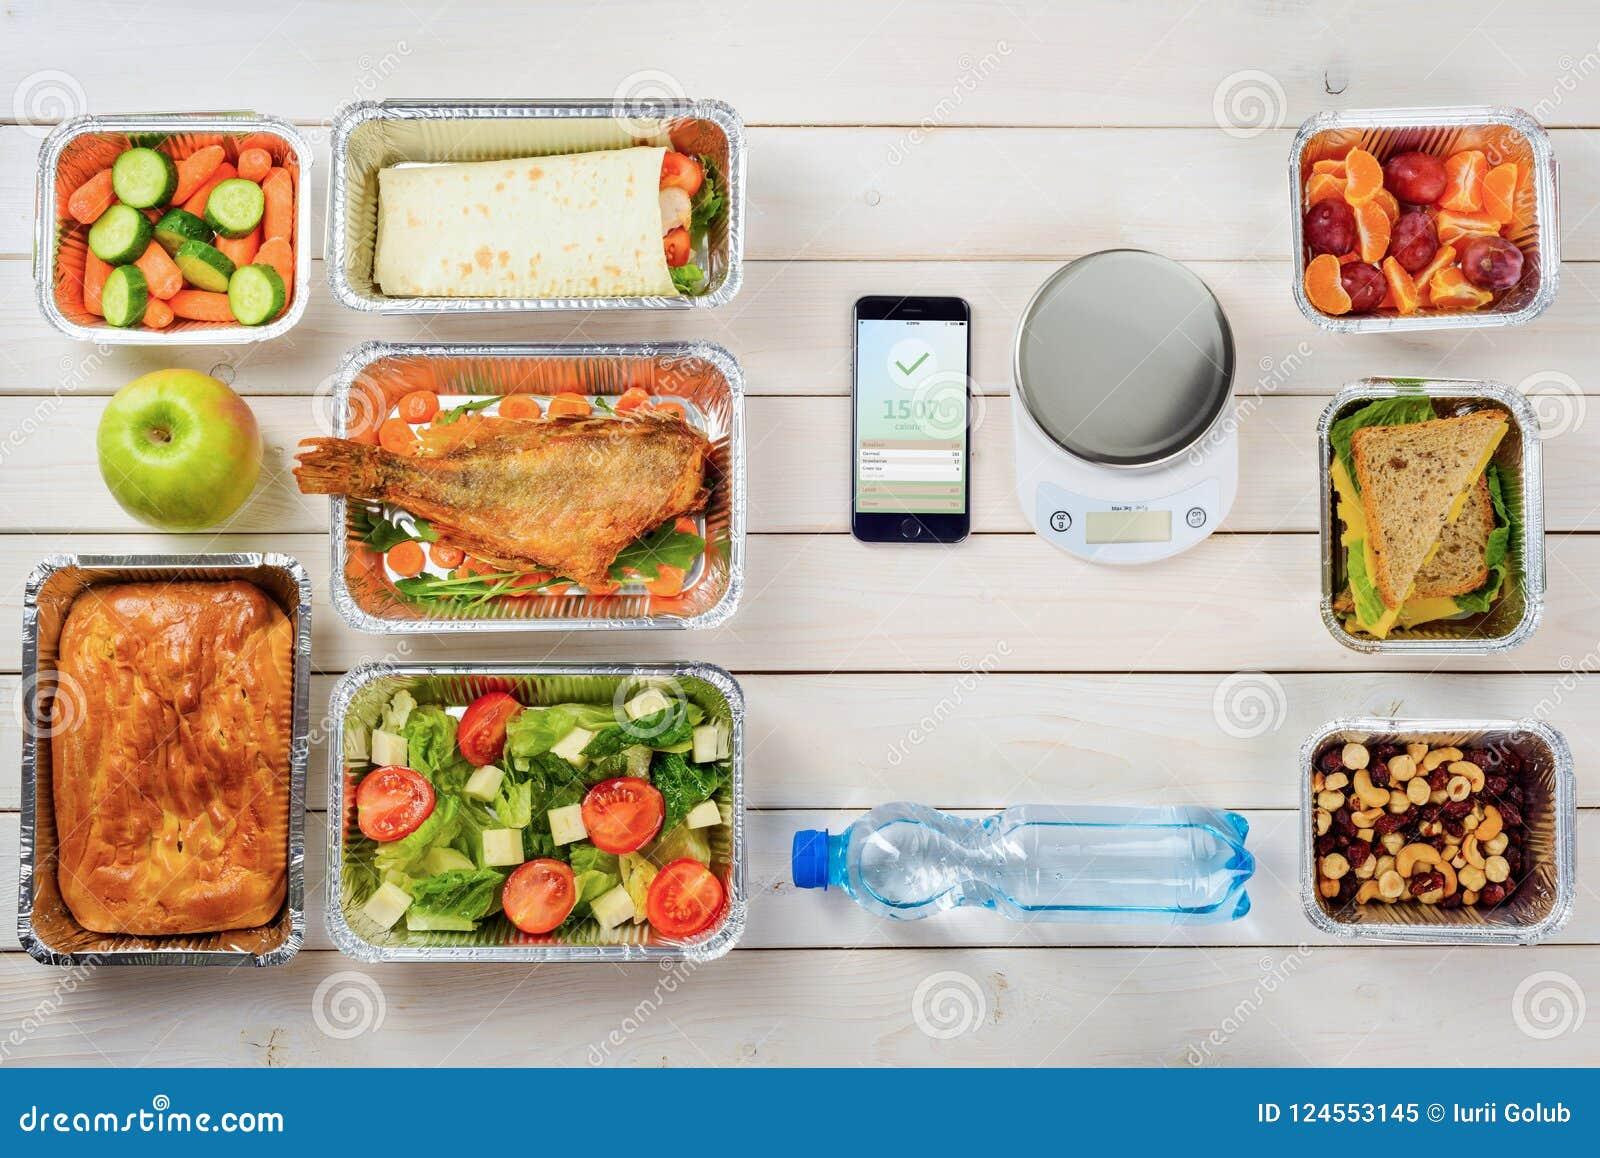 Informatii despre maltitol metabolism